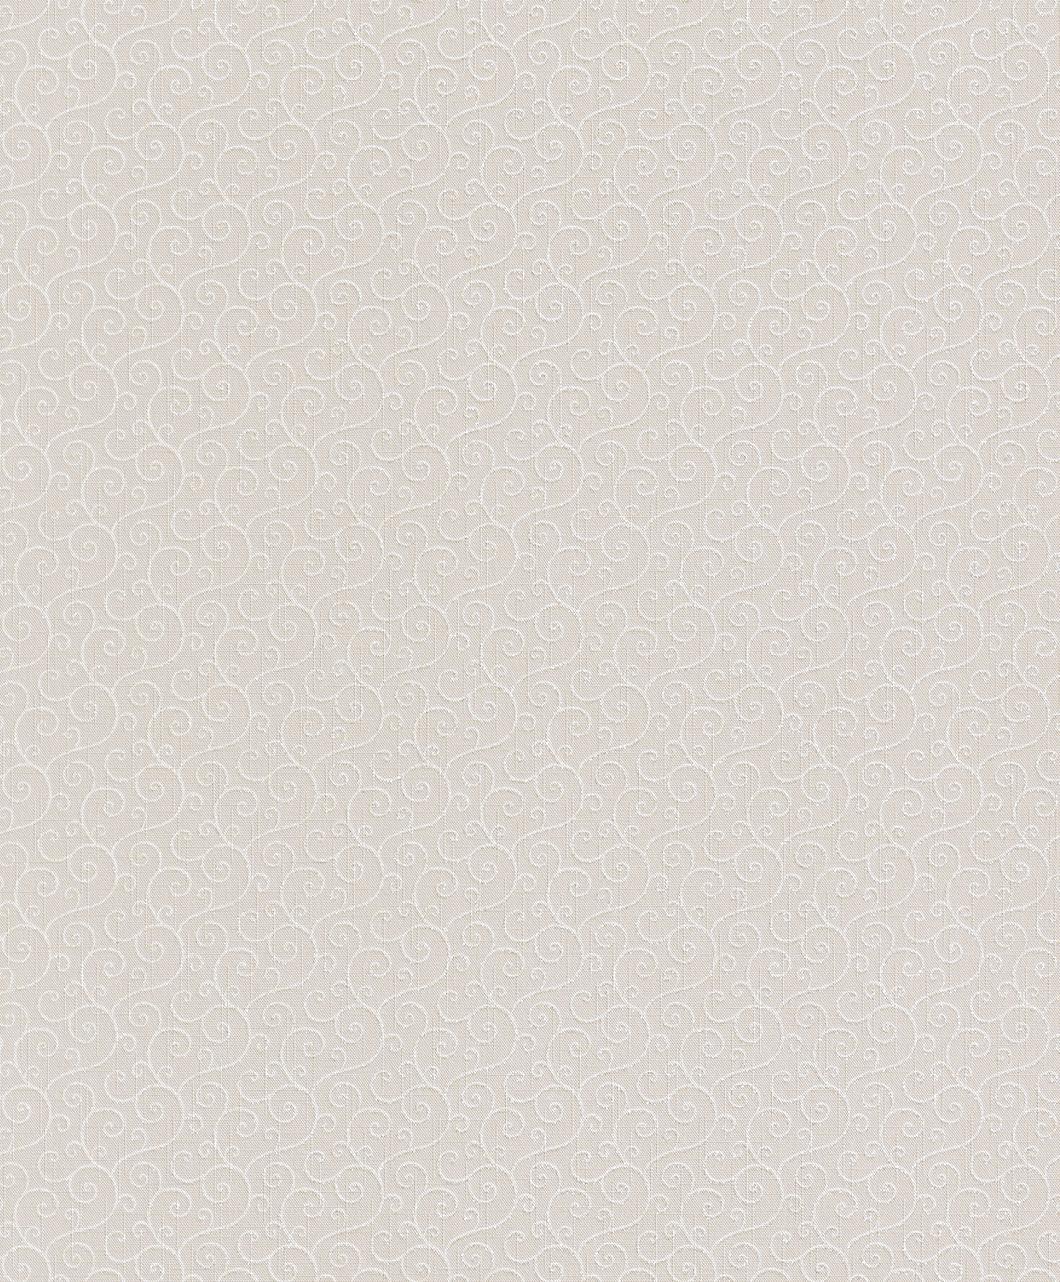 Tapeta na zeď Rasch Shiny Chic 423853 | 0,53x10,05m (Vliesové tapety - béžová, krémová)